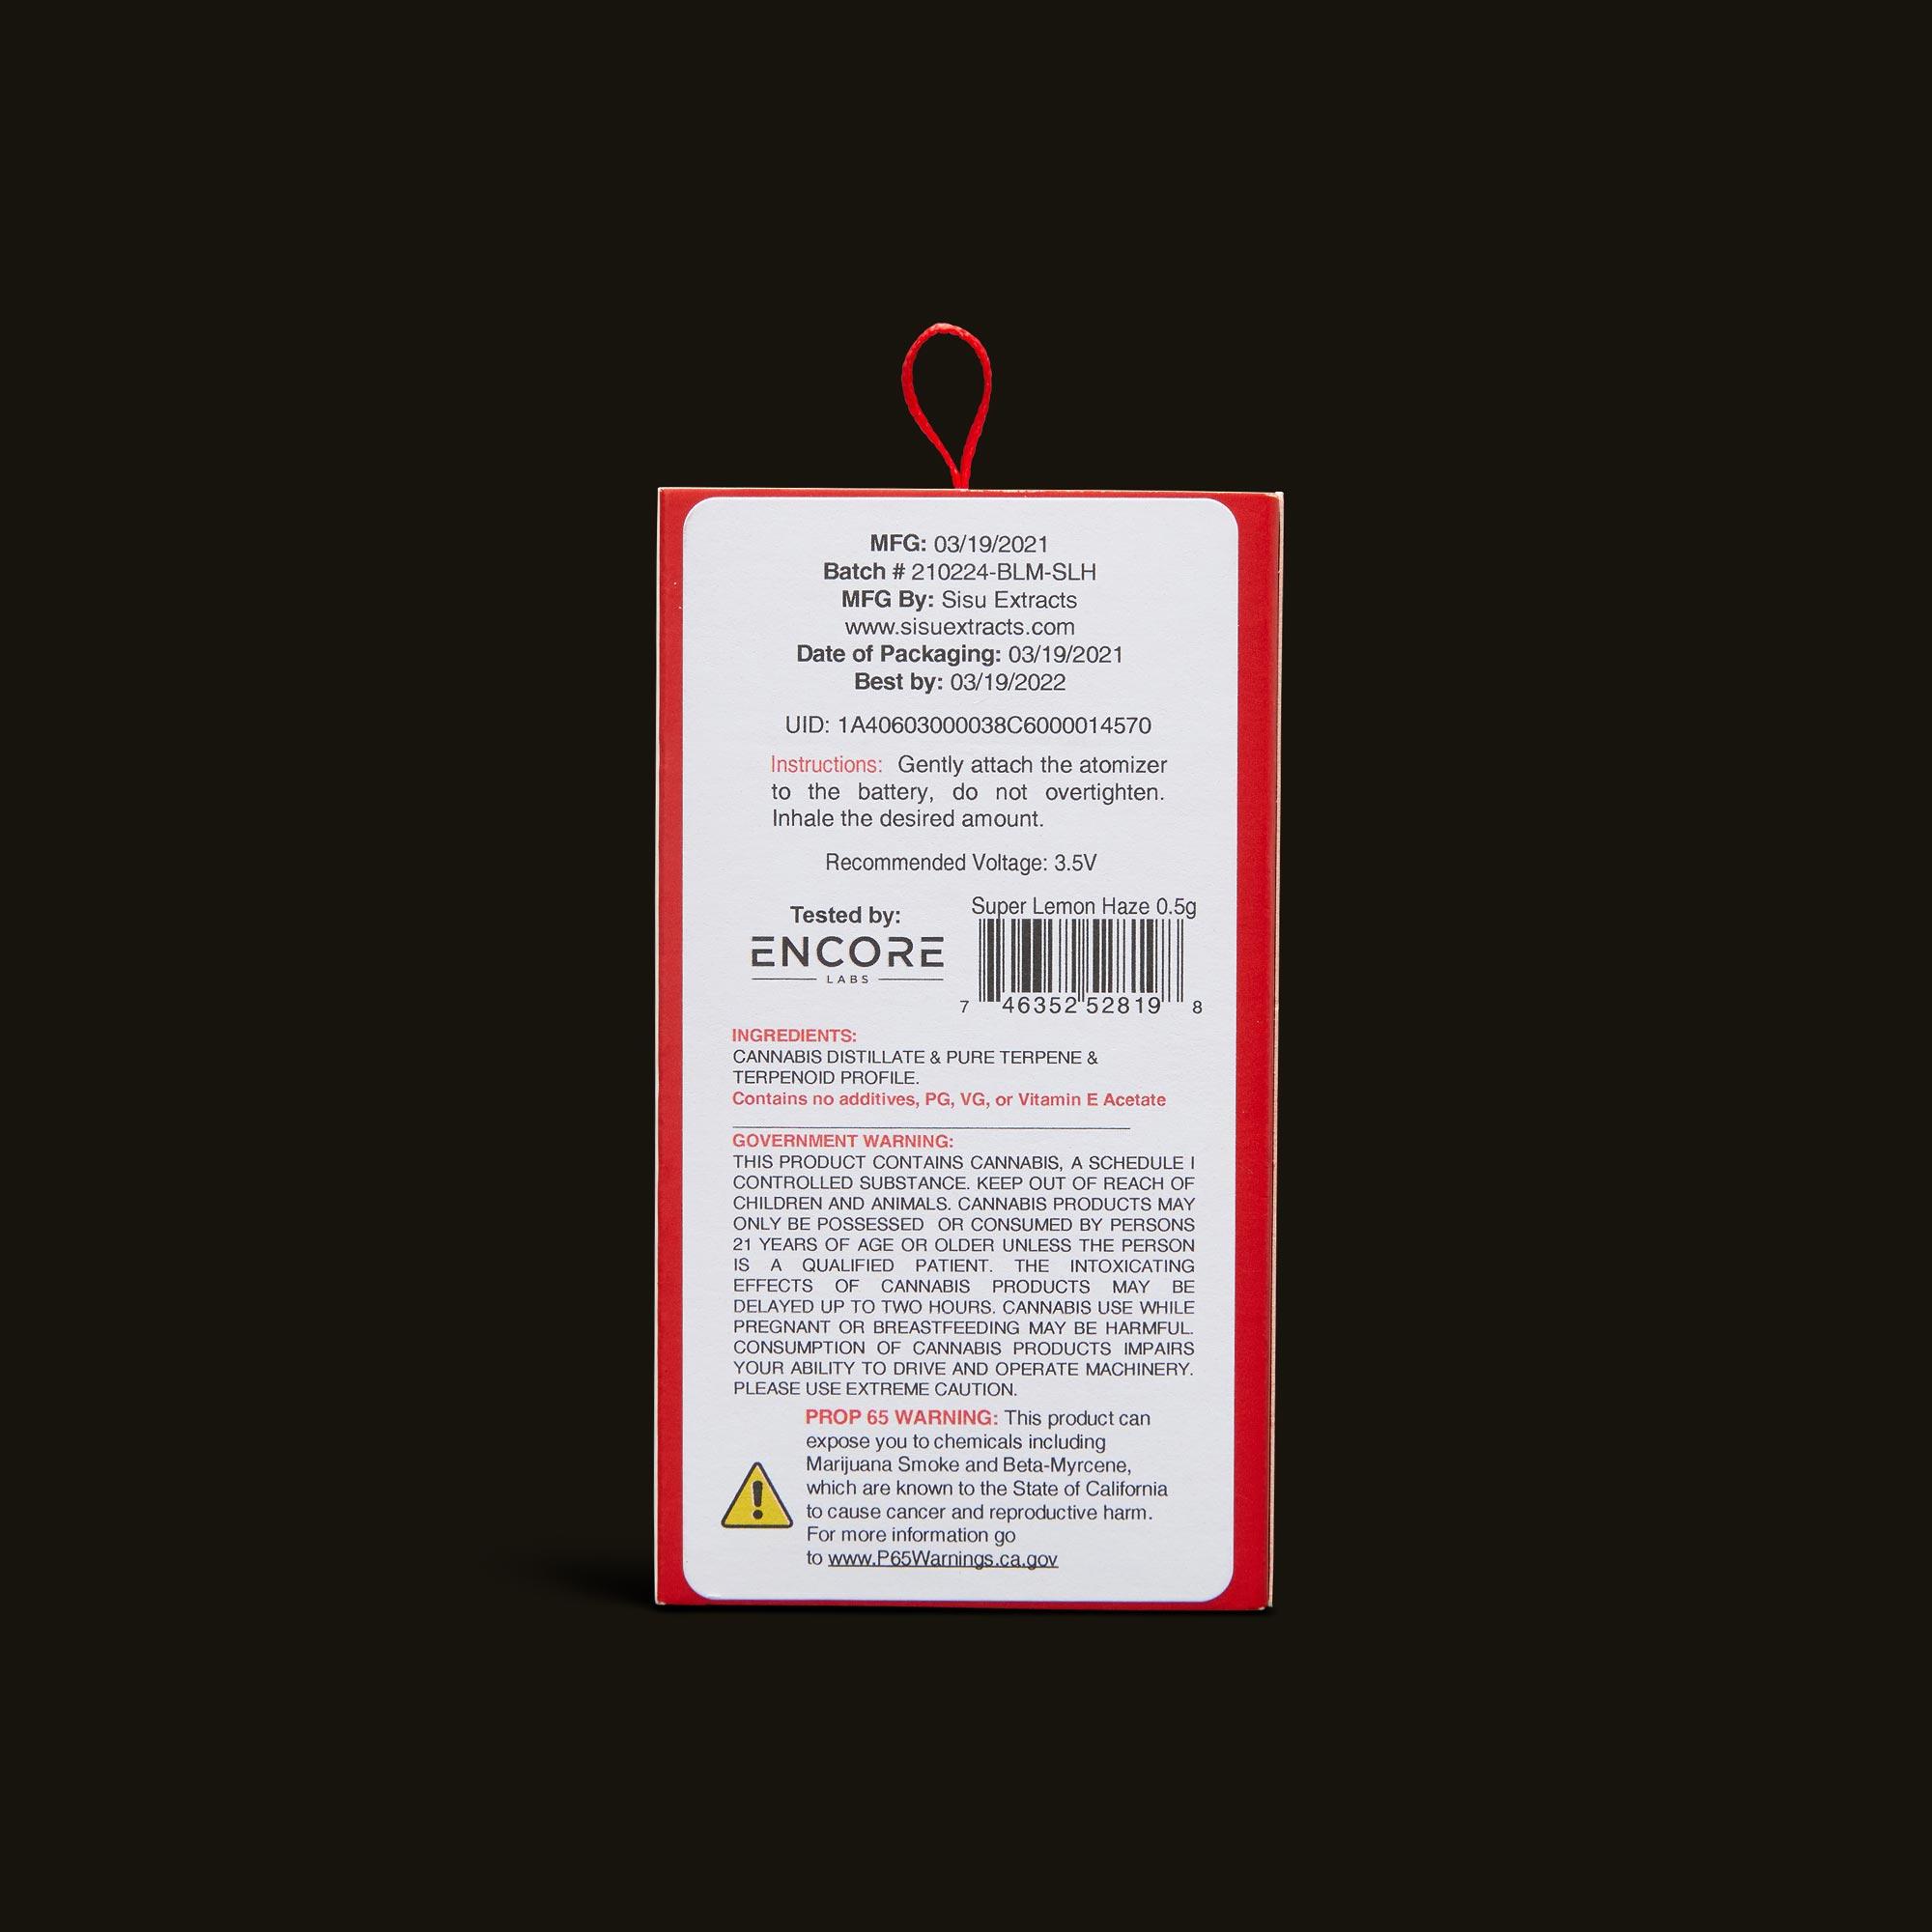 Bloom Brands Vape Pen - Super Lemon Haze Cartridge - .5g